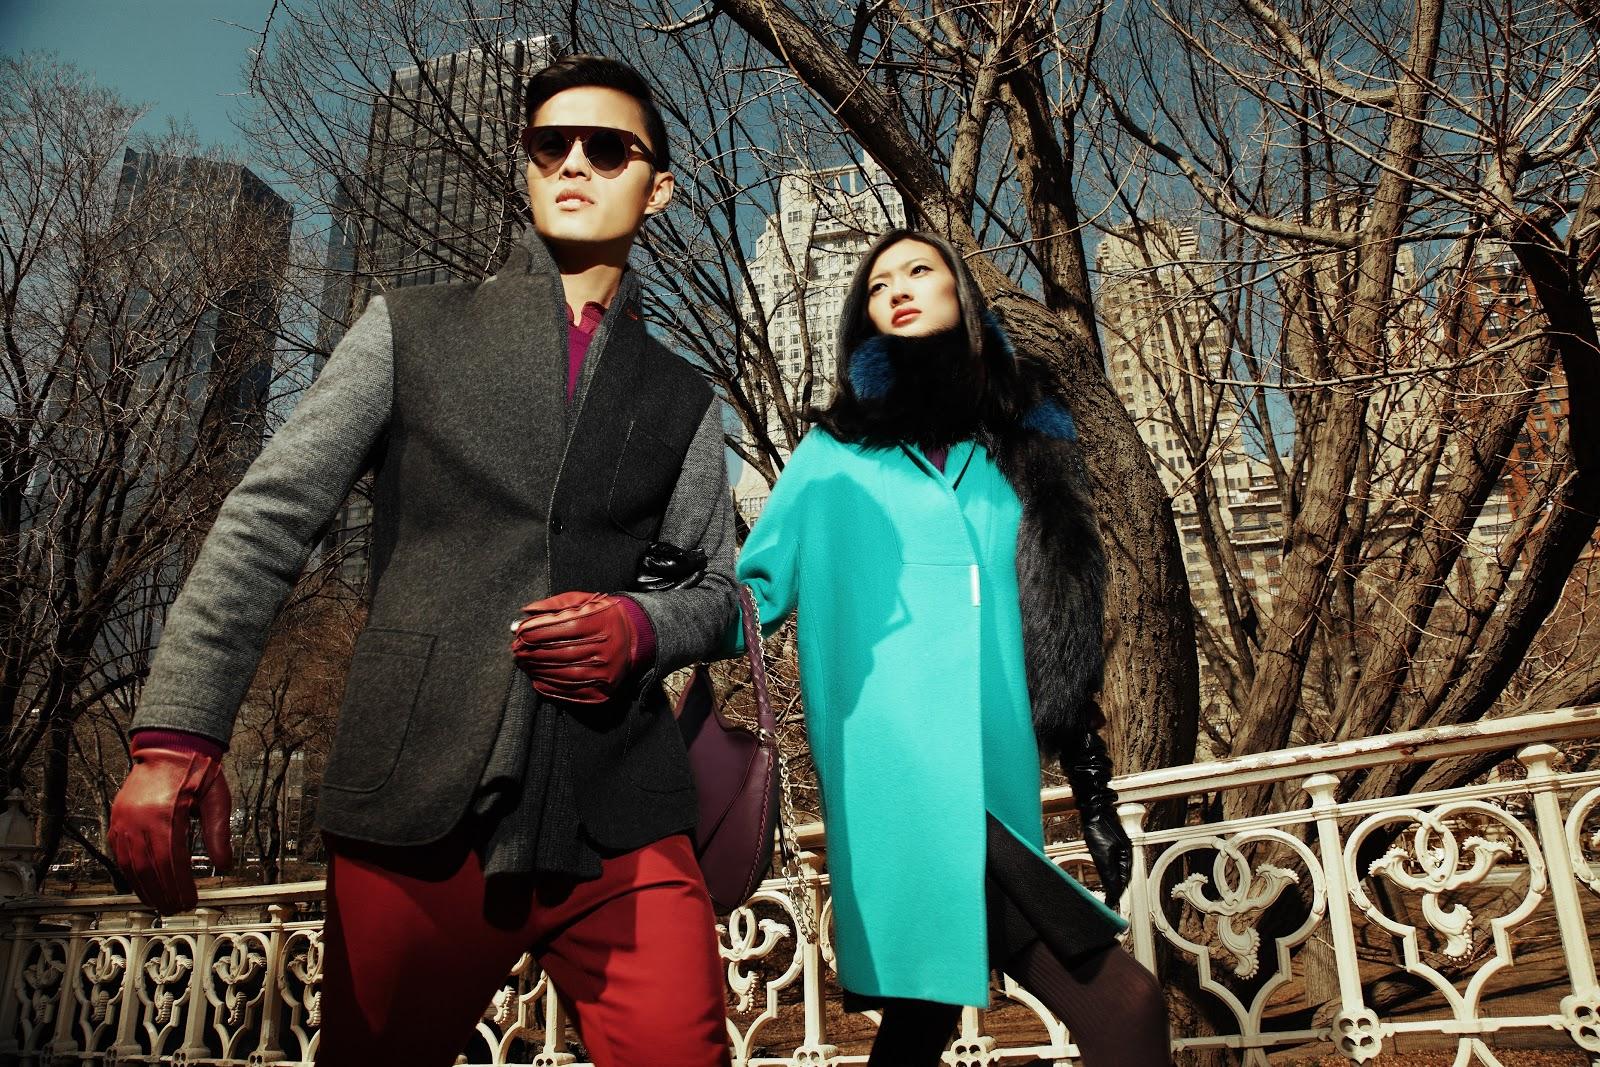 Shanghai Tang Fall 2014 campaign